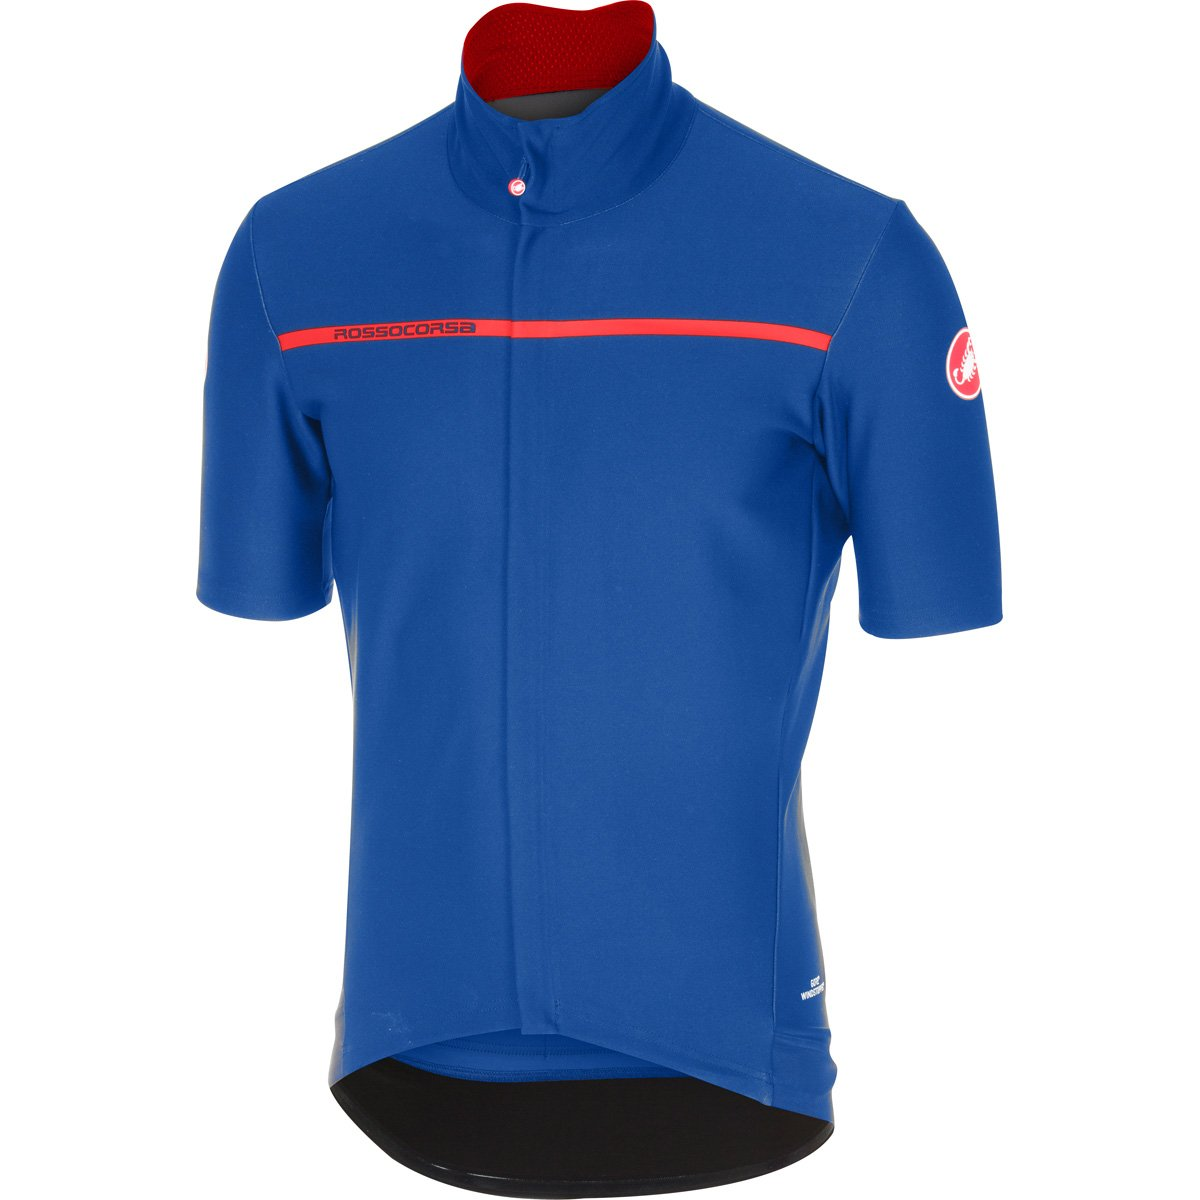 CastelliメンズGabba 3半袖サイクリングjacketb17084 B06WRRZ41C X-Large|サーフブルー サーフブルー X-Large